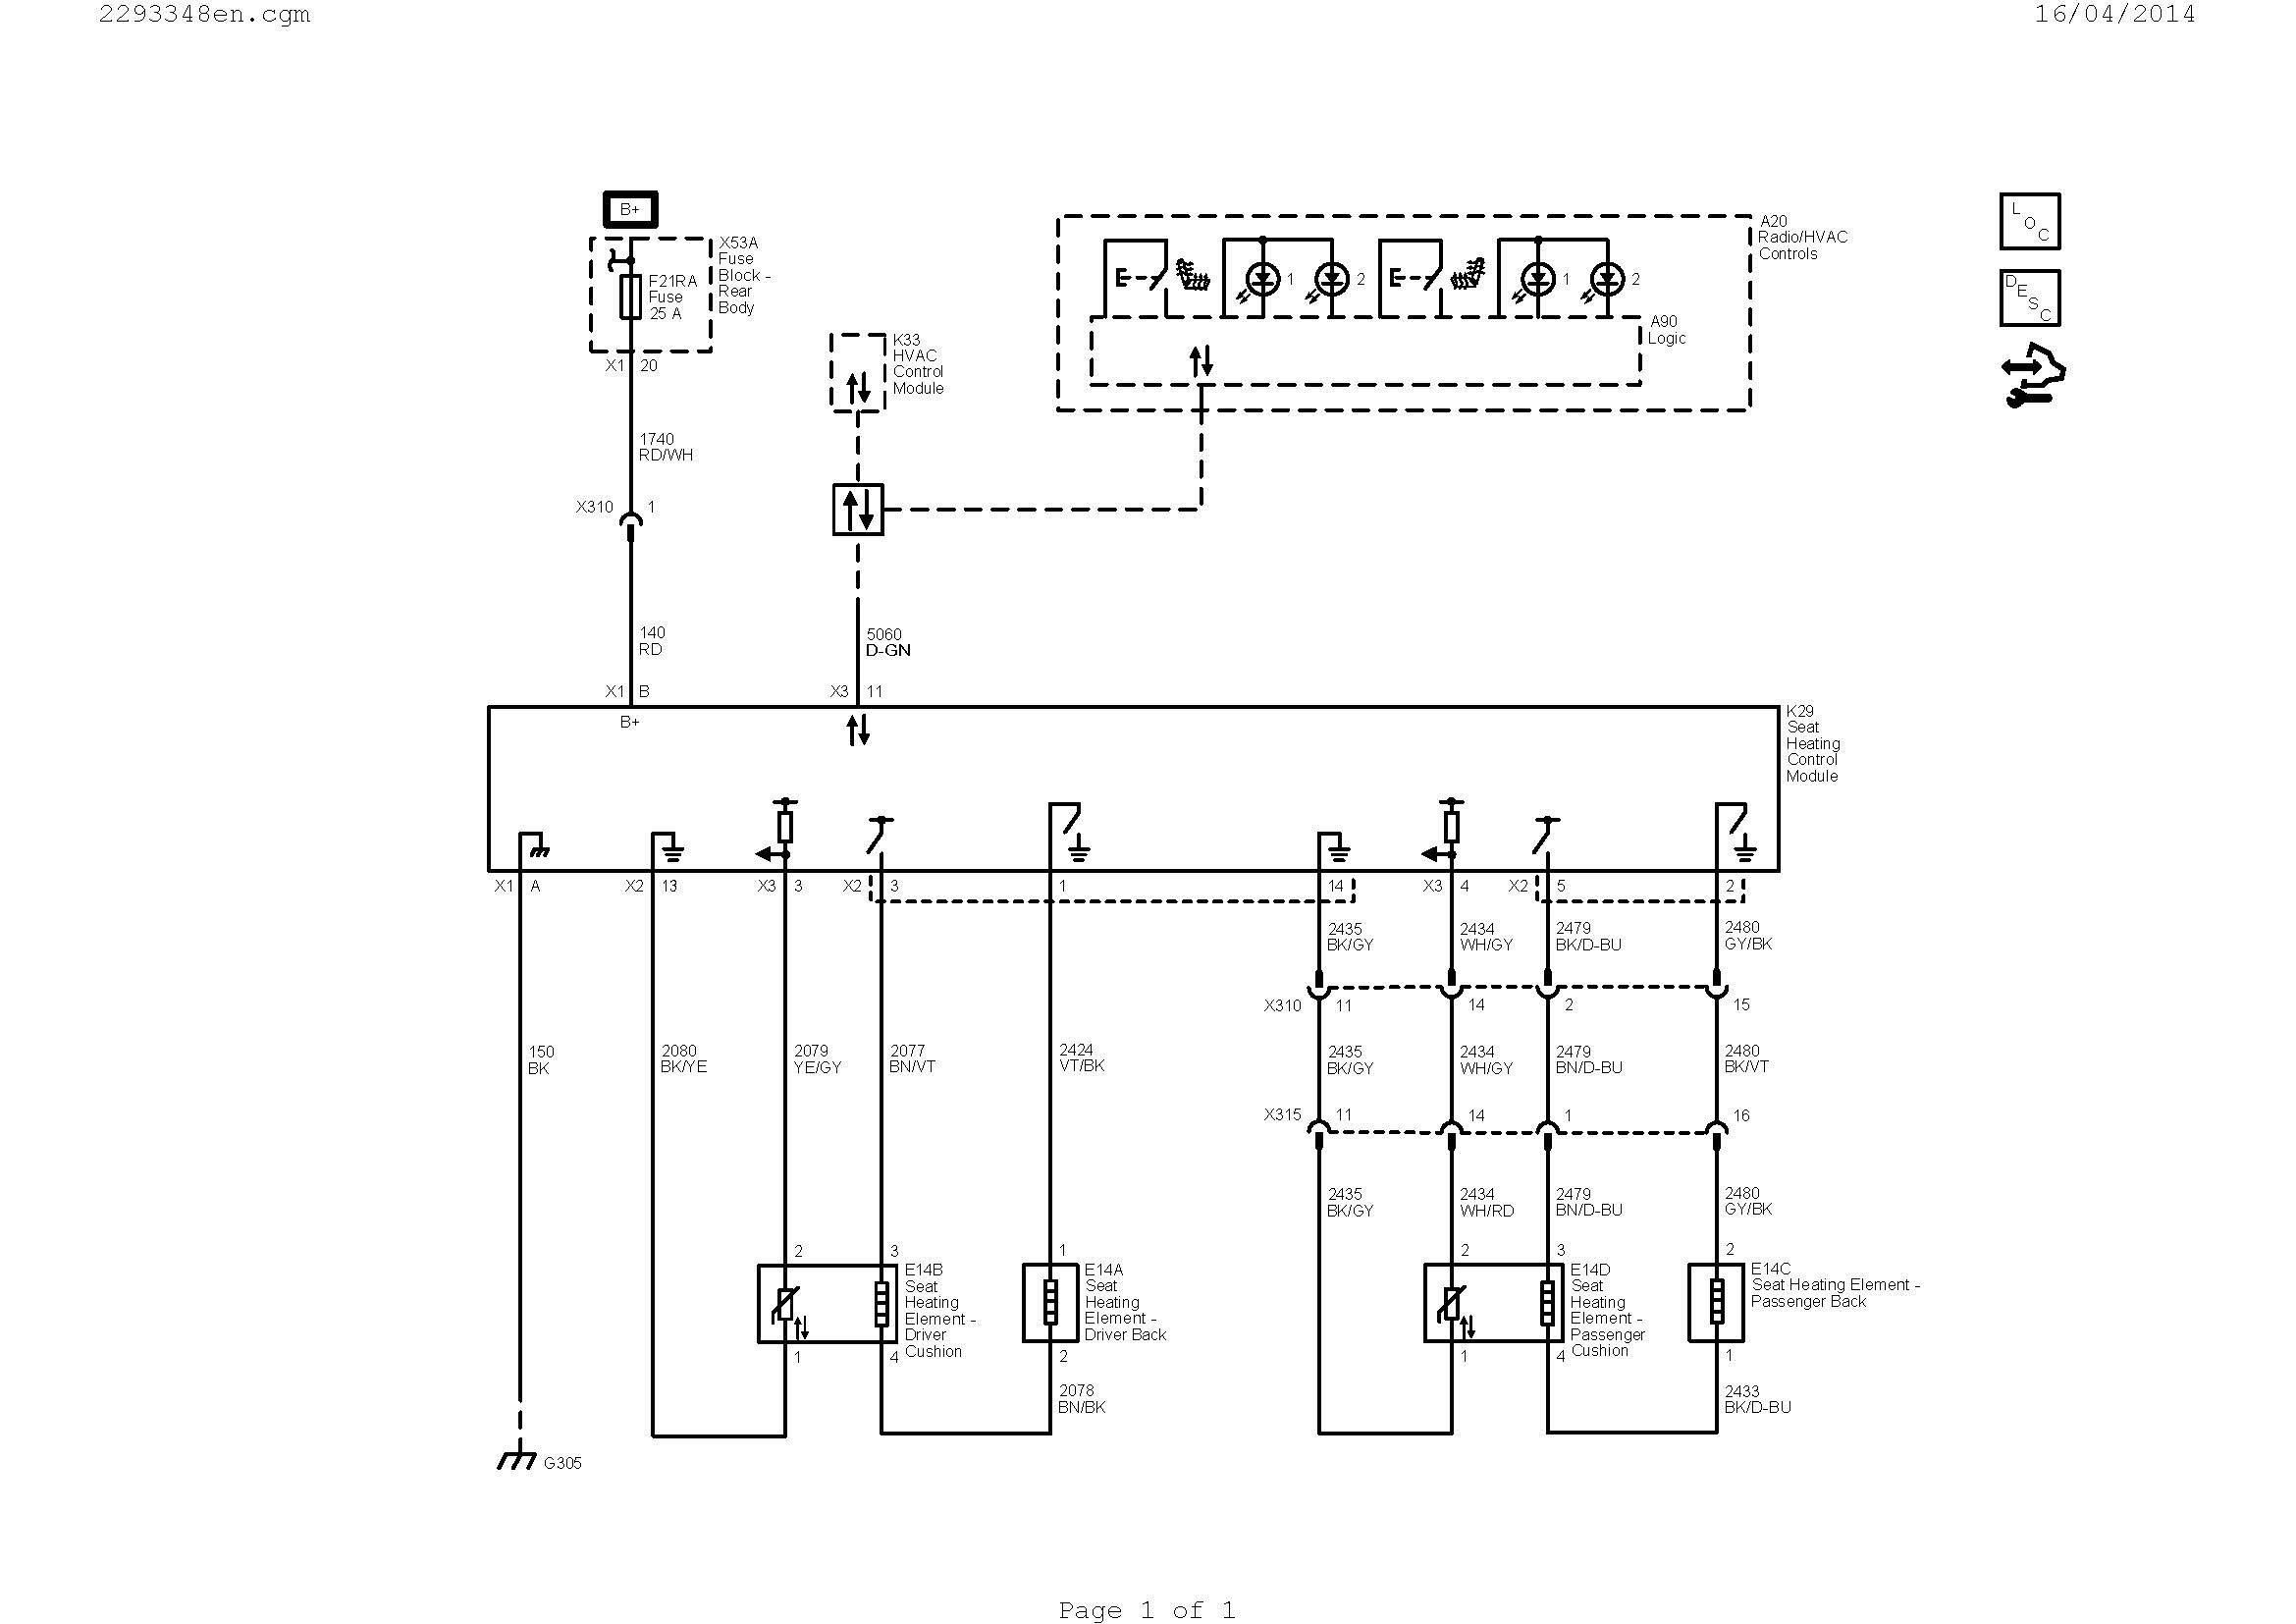 Gas Station Diagram Electrical Wiring Diagram Trailer Wiring Diagram Trailer Light Wiring